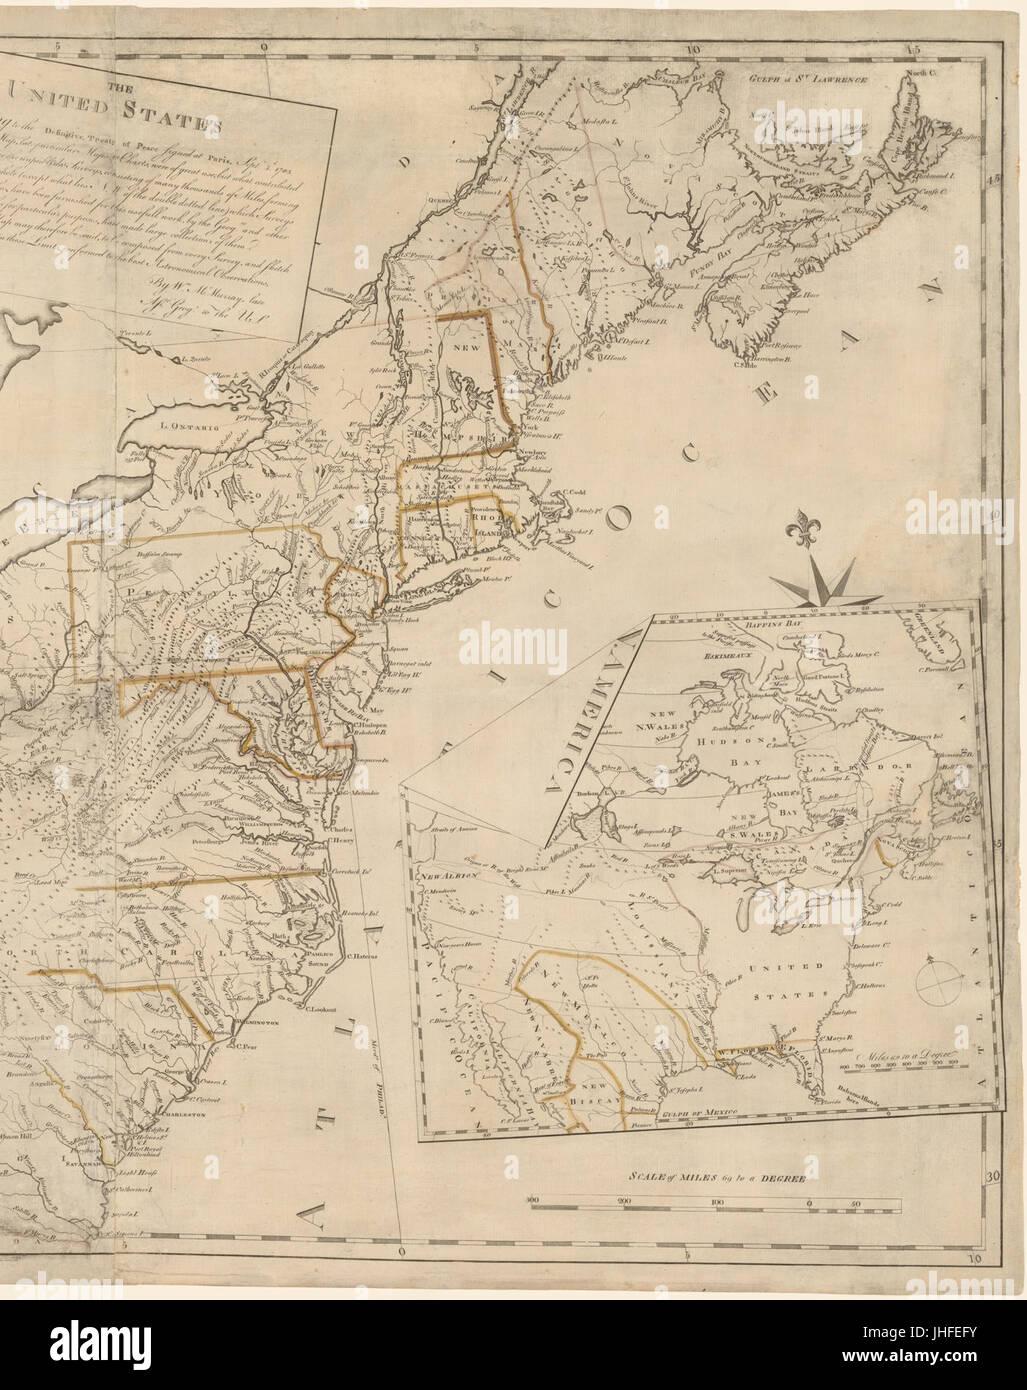 Treaty Of Paris Map 1783.Treaty Of Paris 1783 Stock Photos Treaty Of Paris 1783 Stock